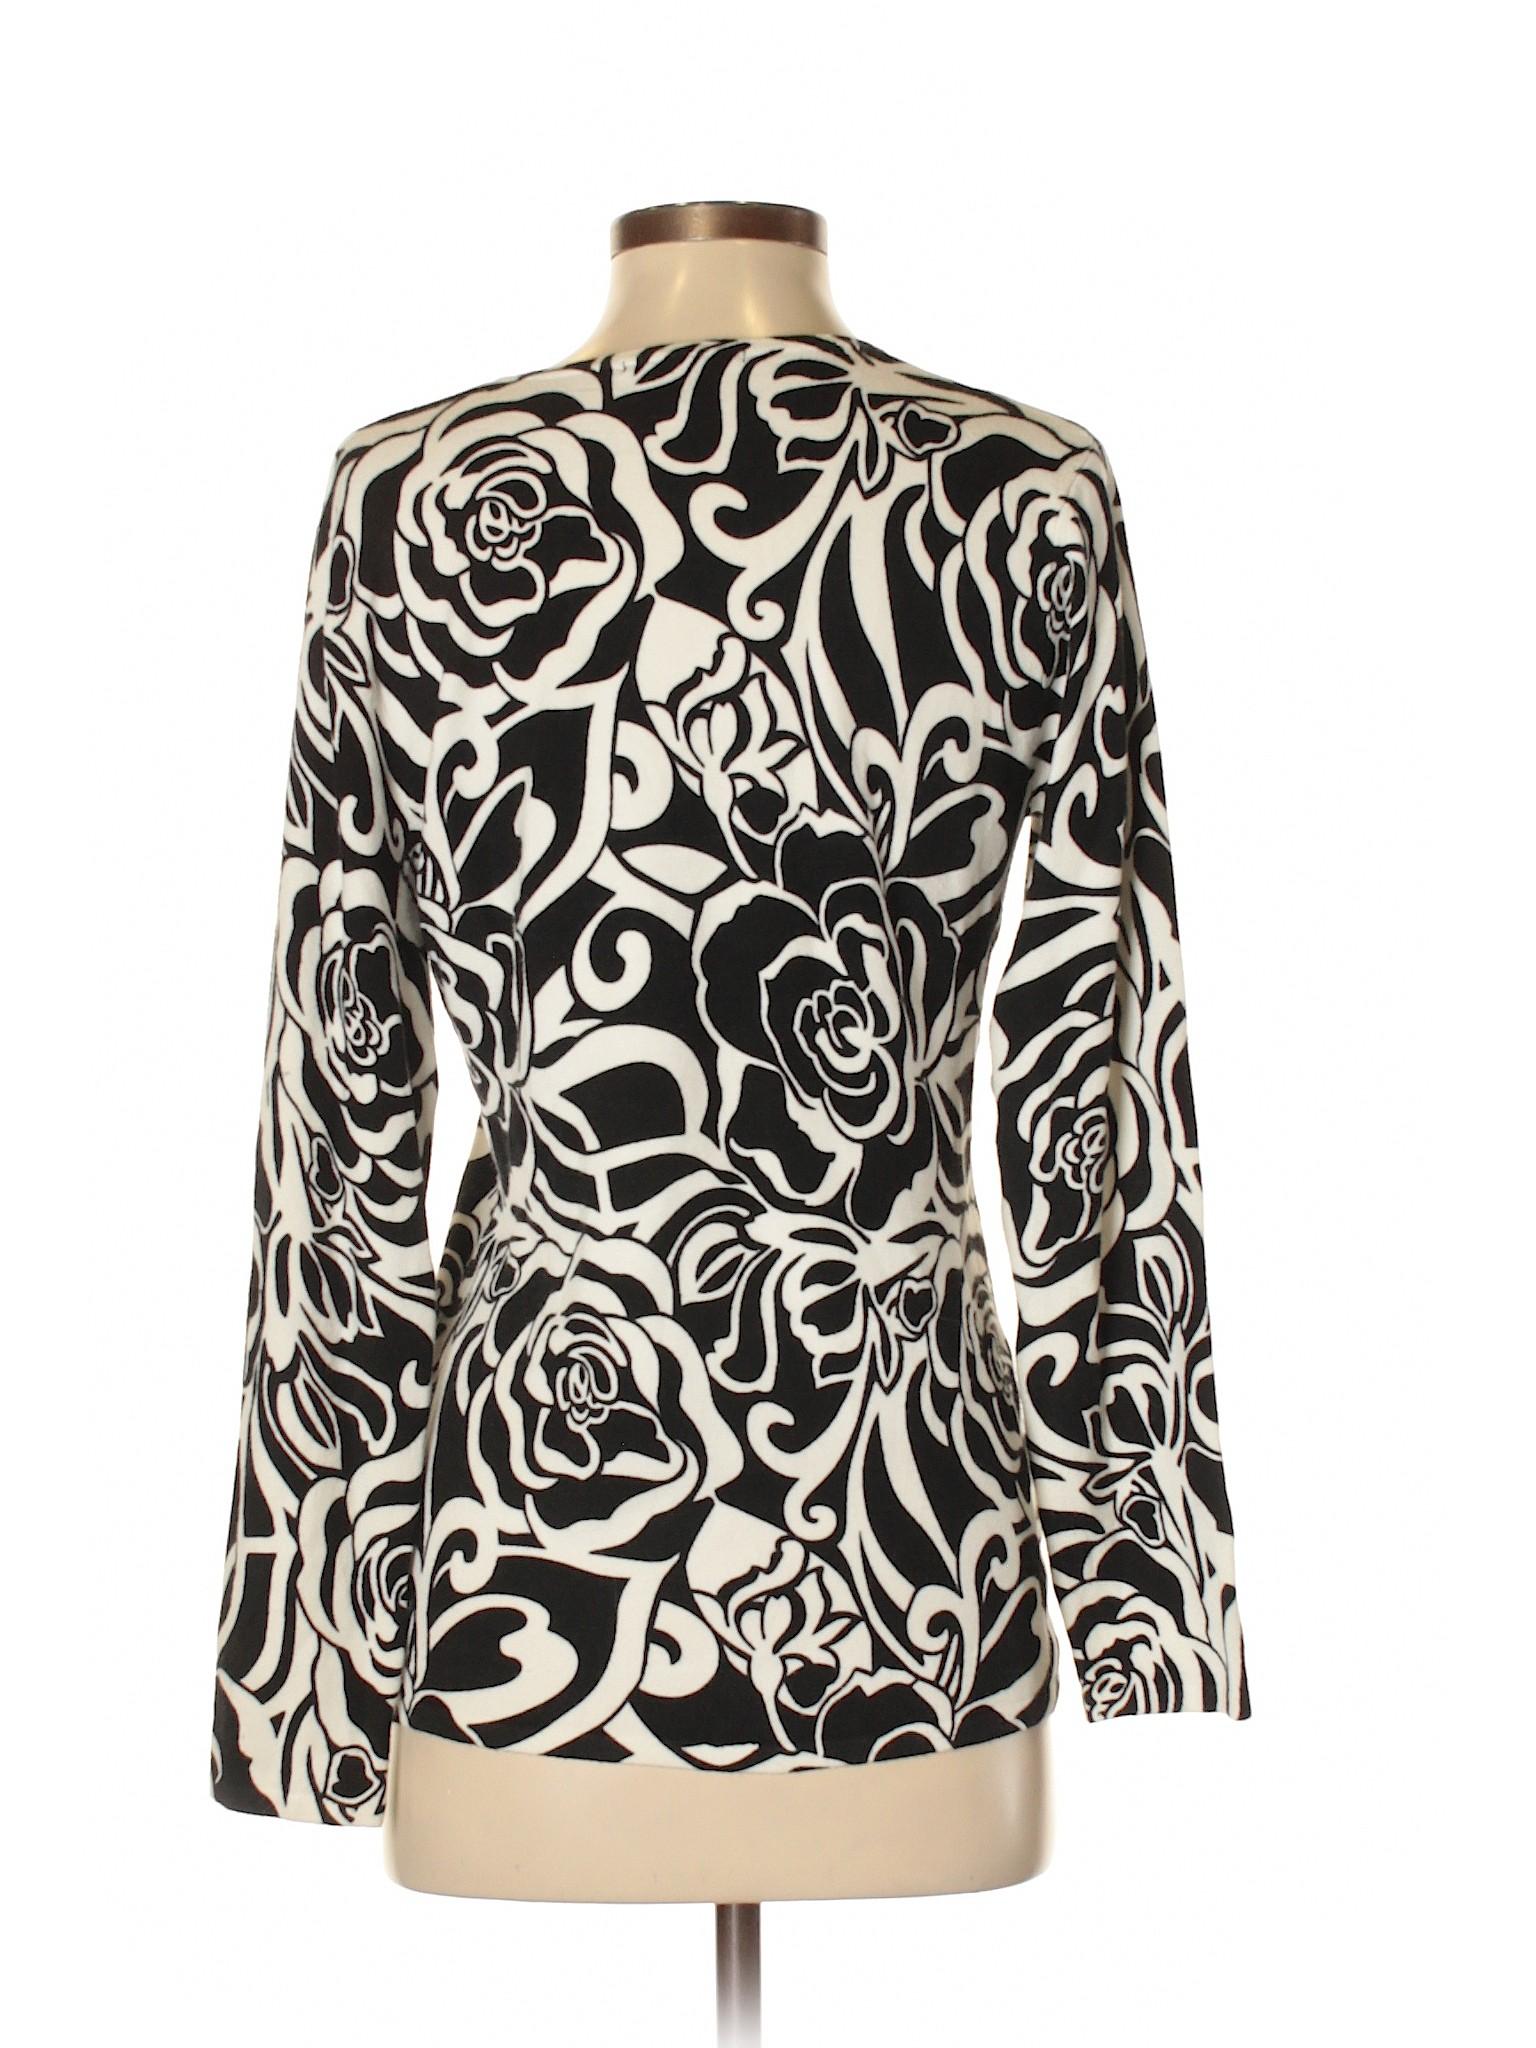 Boutique Boutique Cyrus Boutique Cyrus Pullover Pullover Sweater Pullover Sweater Cyrus Cyrus Boutique Pullover Sweater 66RwqtB